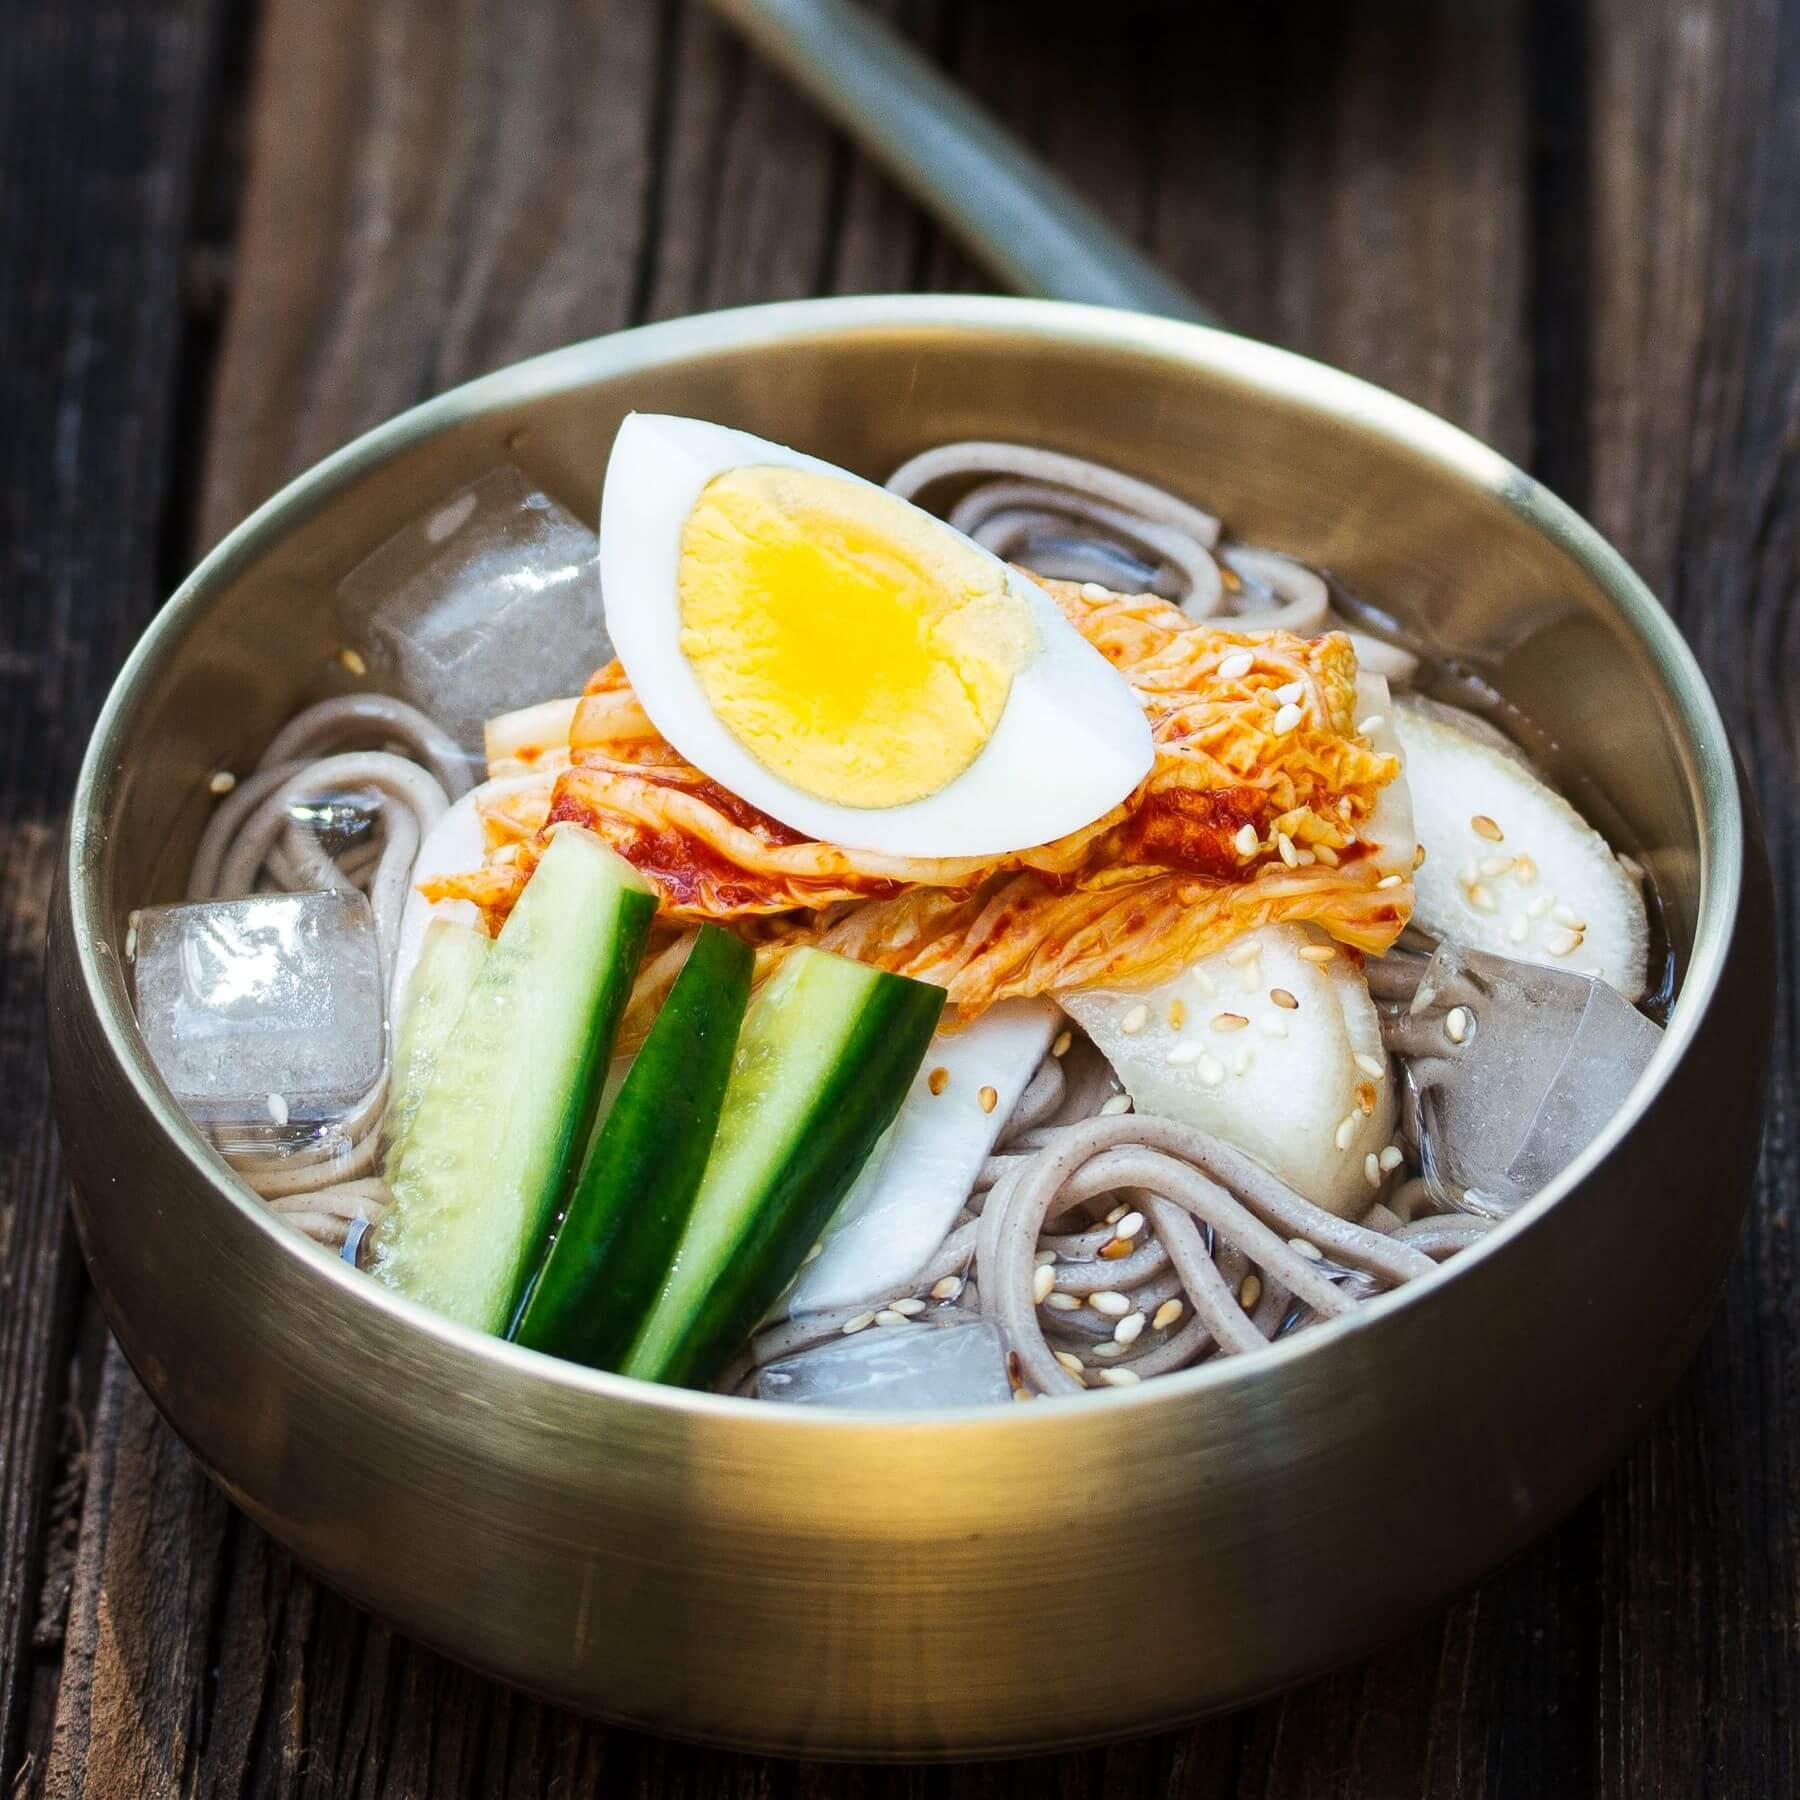 Sommerliche Nudelsuppe aus Korea - Mul-Naengmyeon